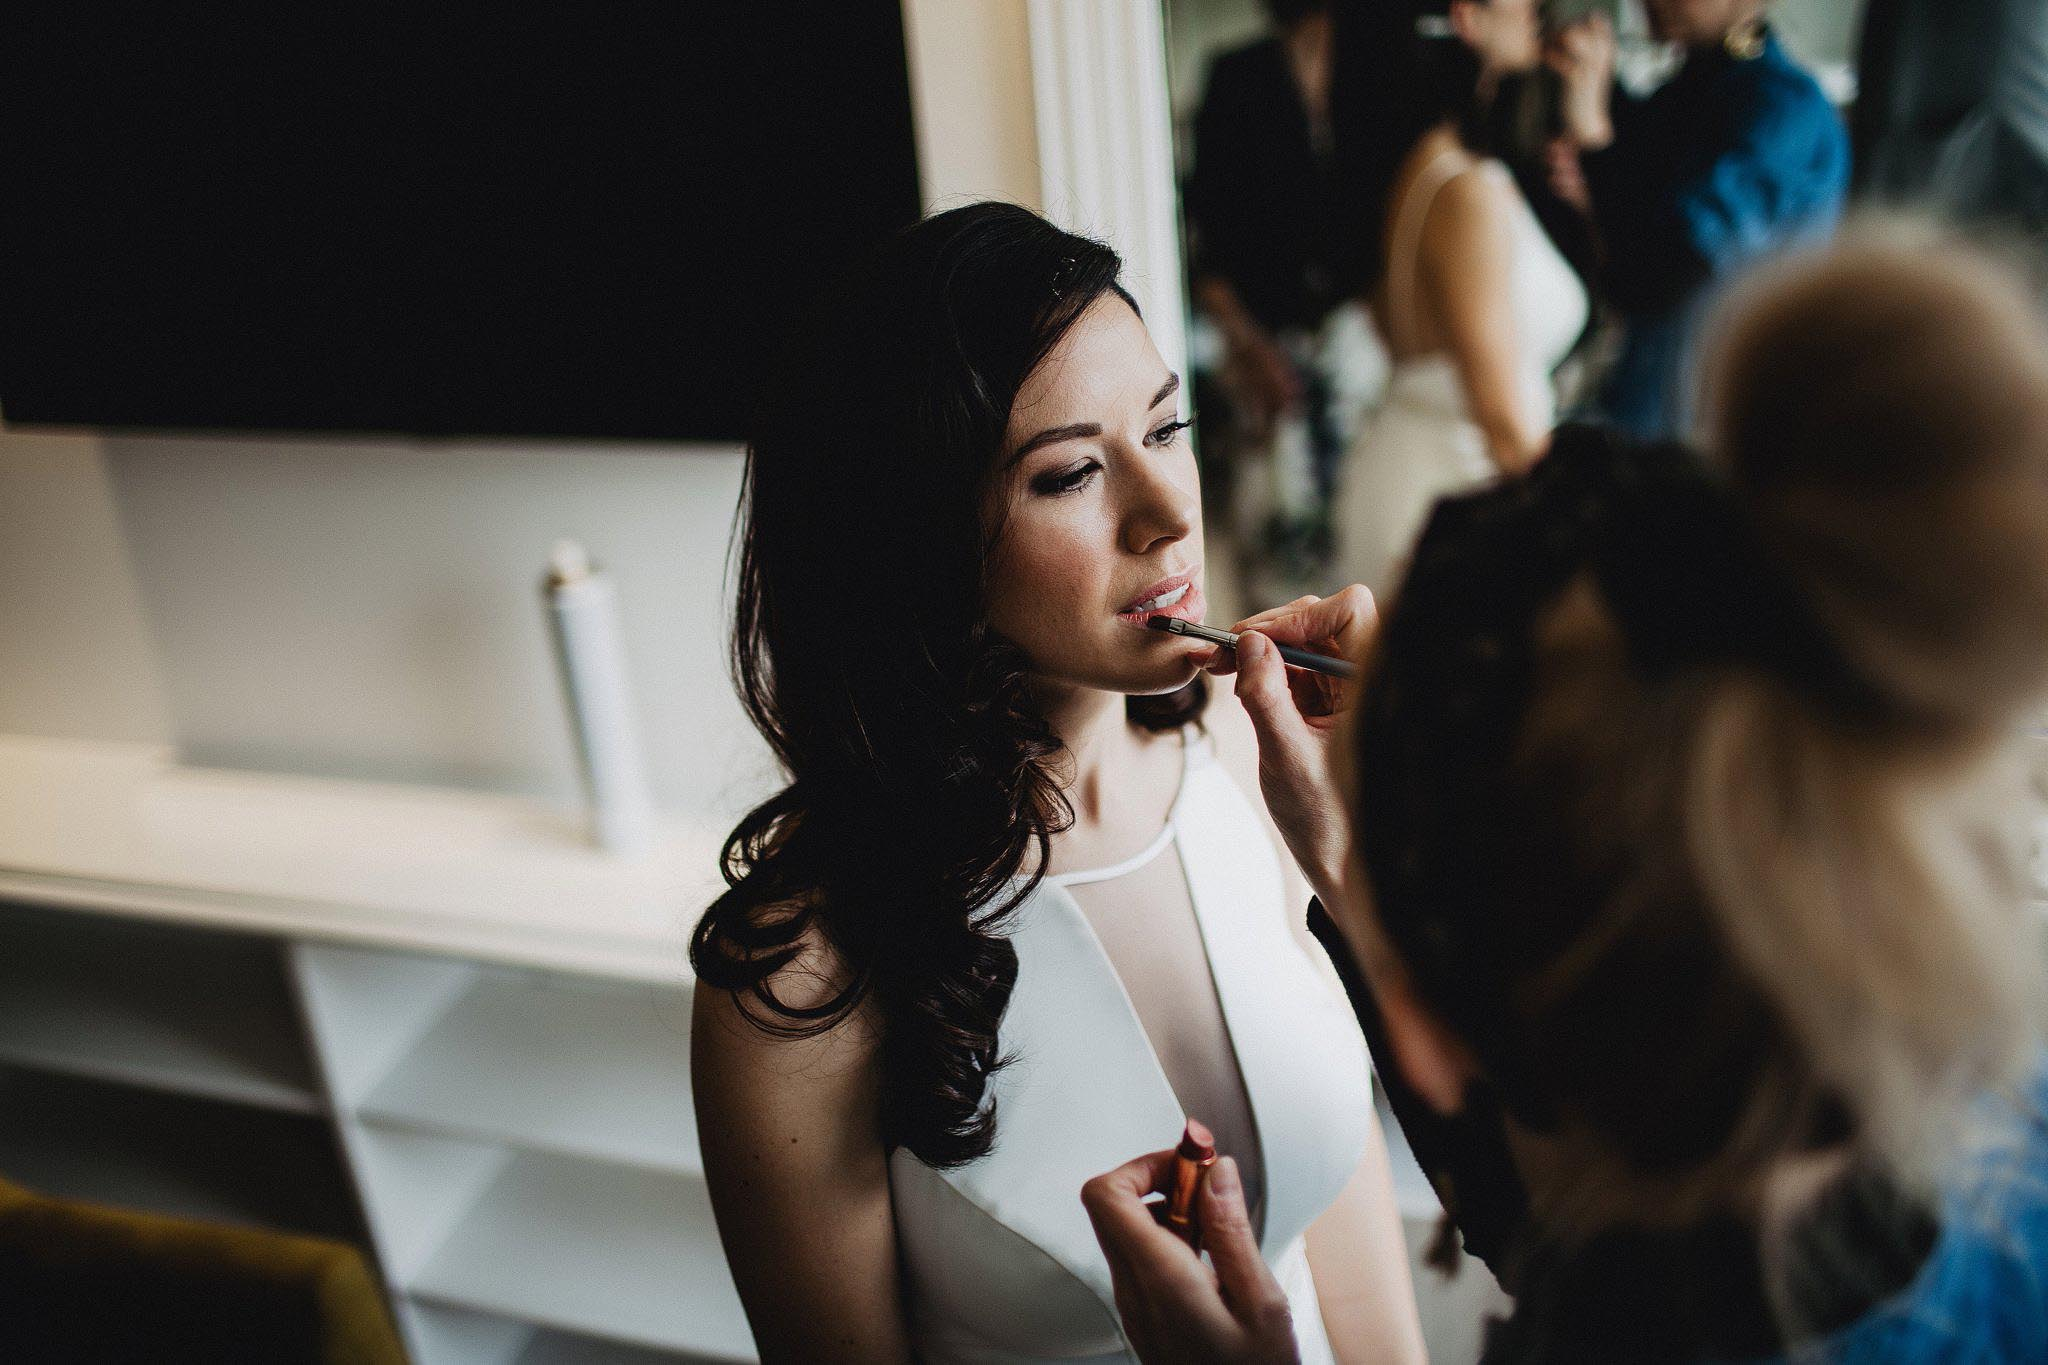 derbyshire-makeup-artist-weddings